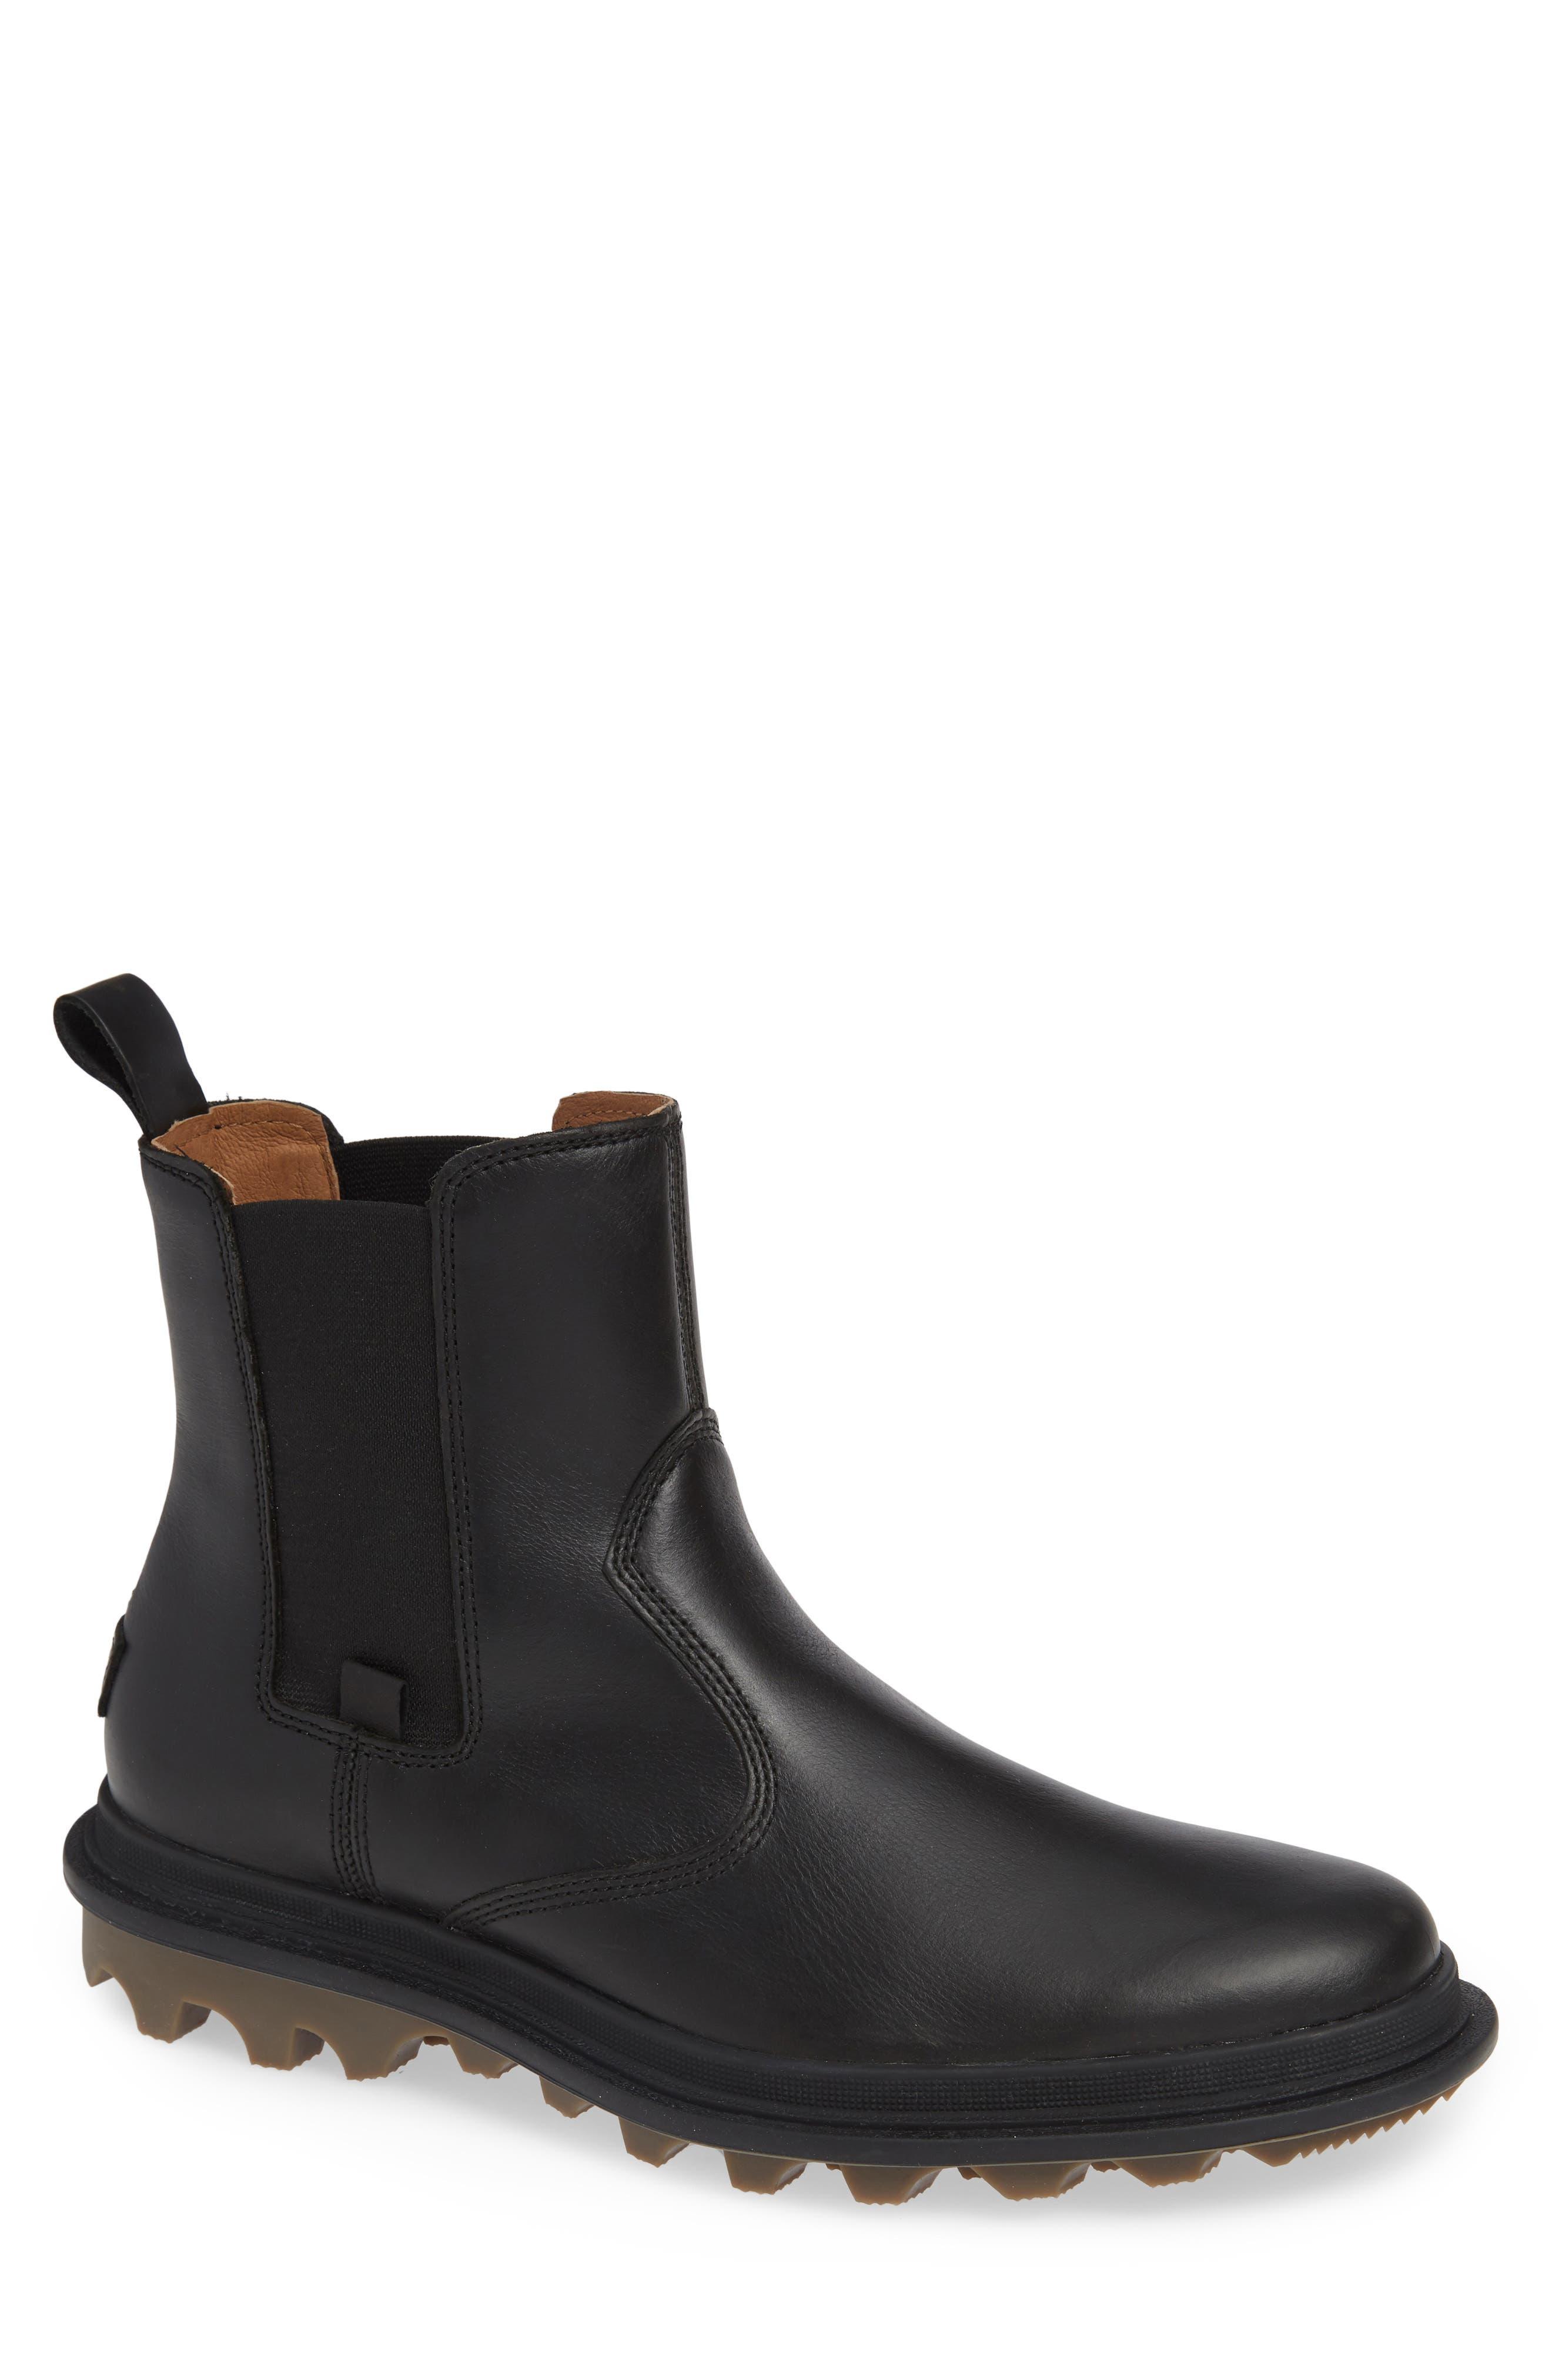 SOREL Ace Waterproof Chelsea Boot, Main, color, 010